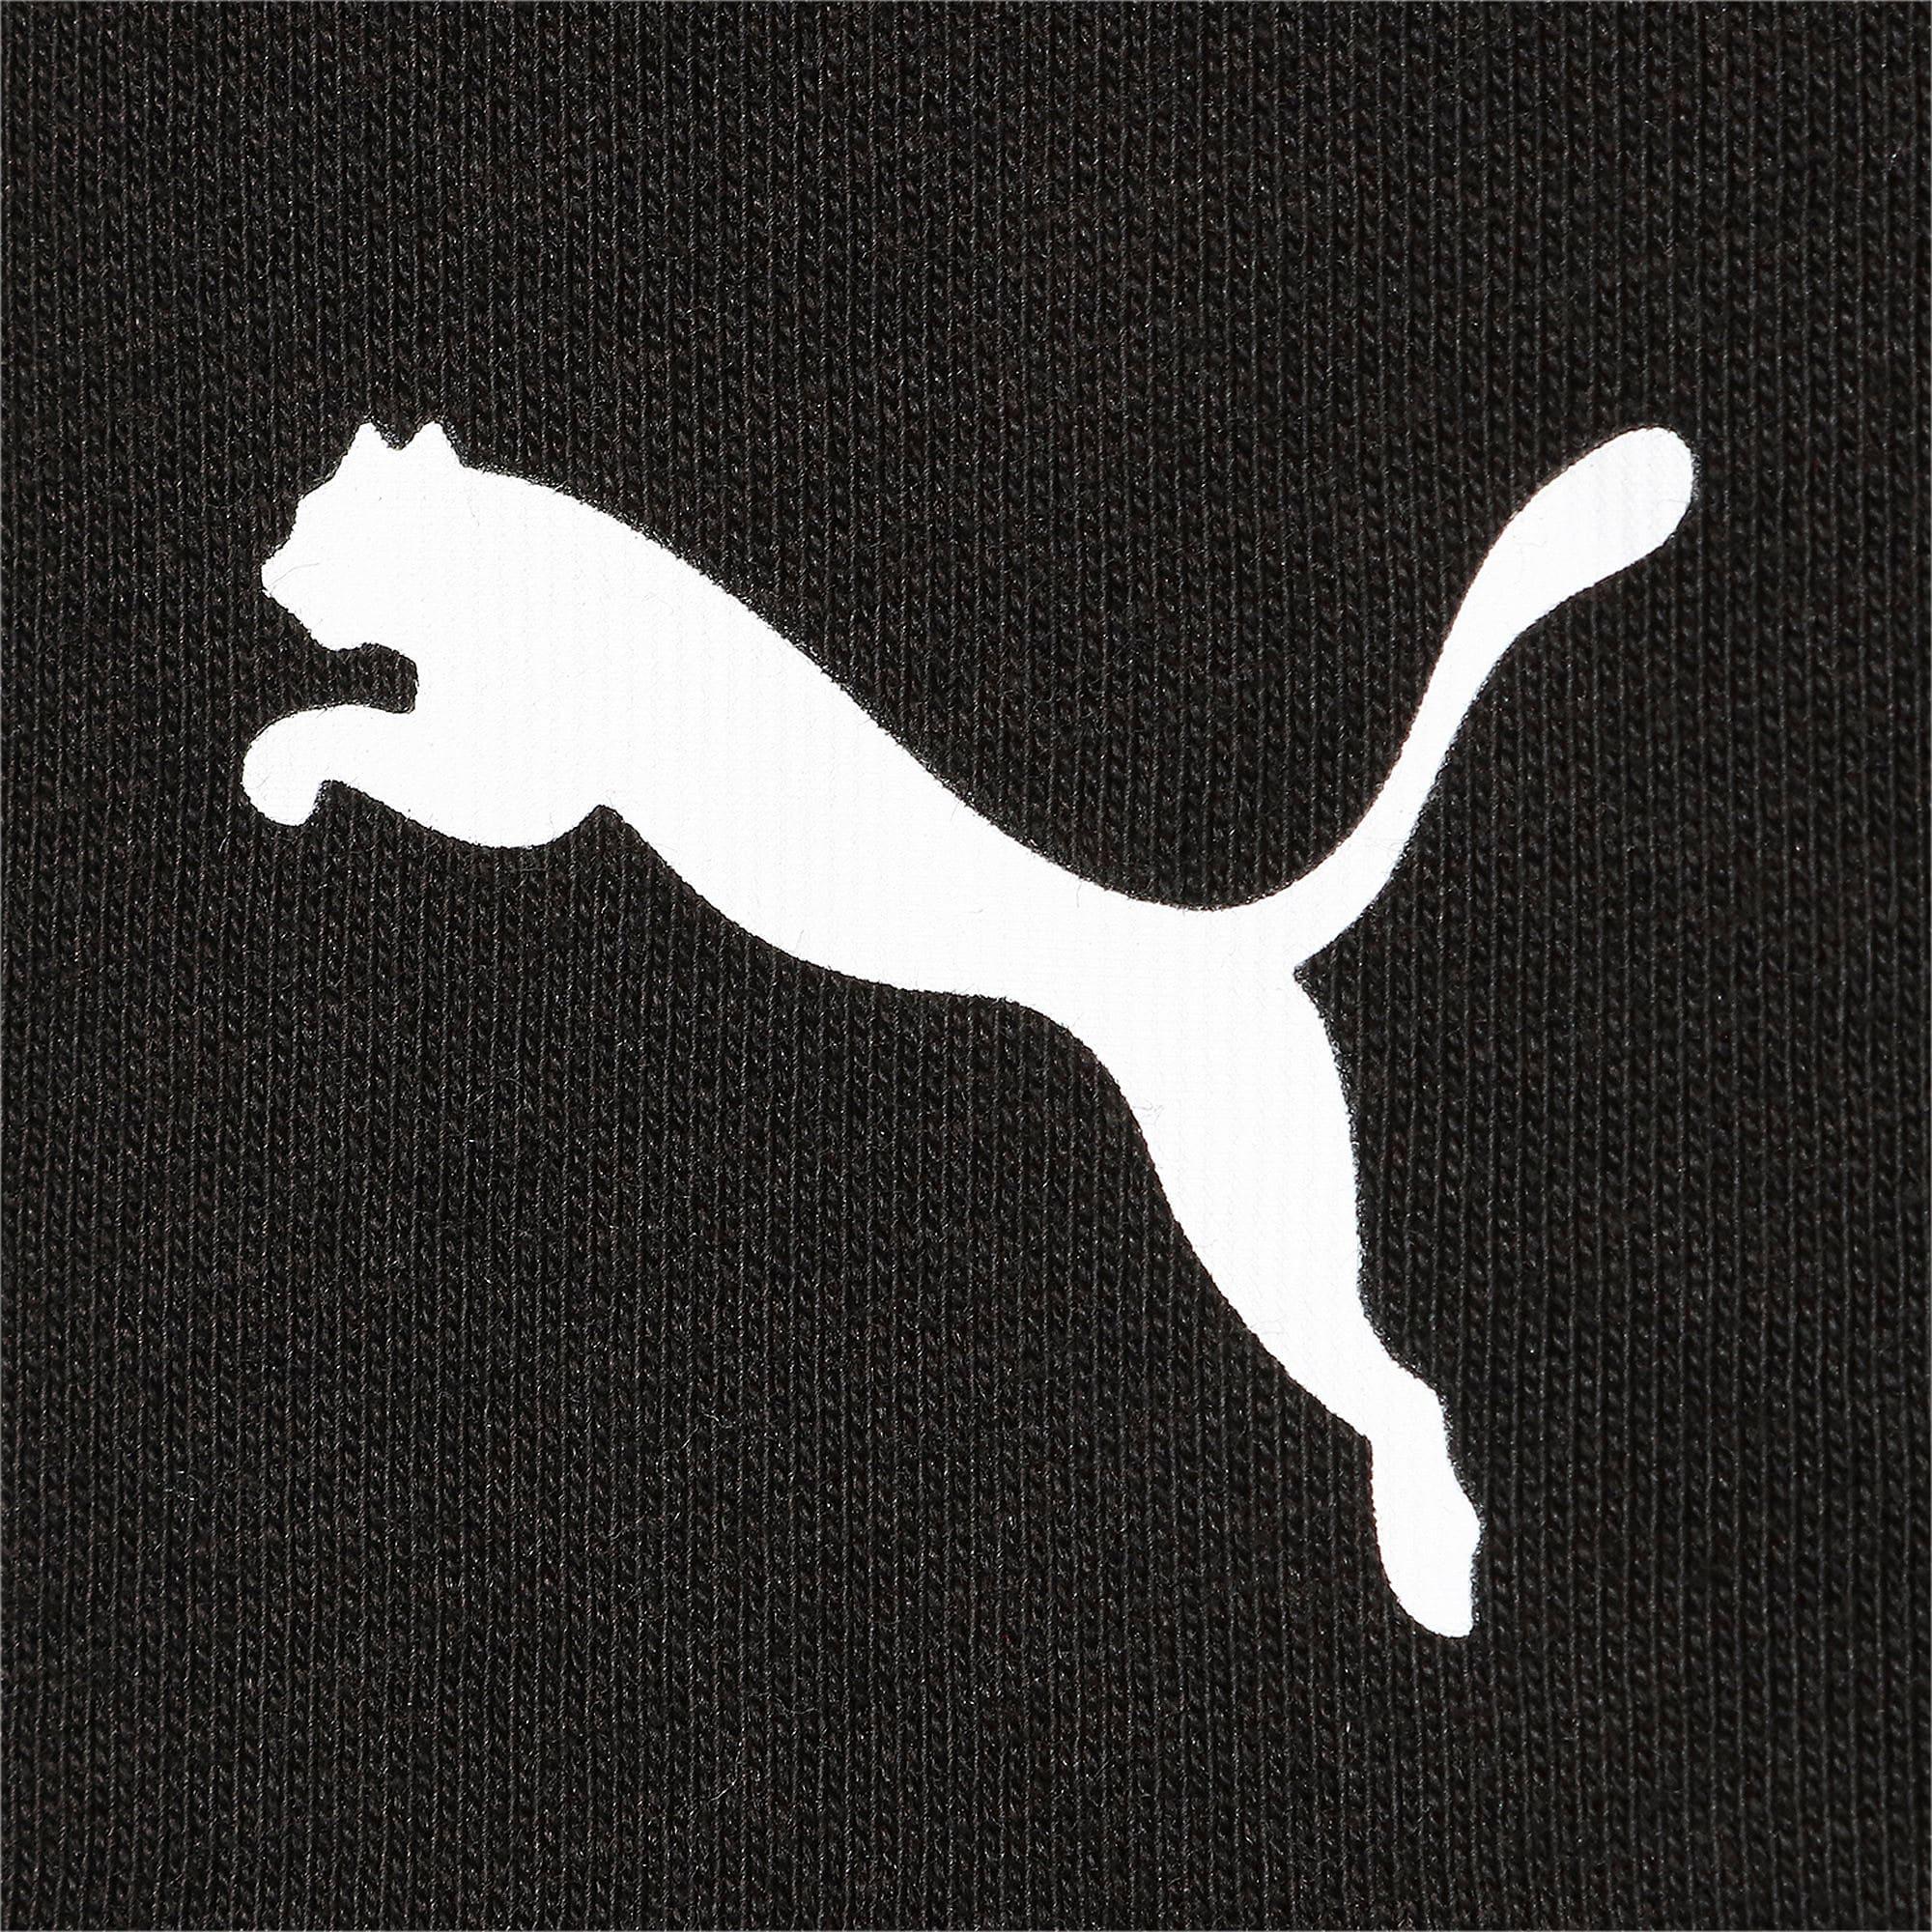 Thumbnail 7 of BMW MMS ロゴ Tシャツ +, Puma Black, medium-JPN